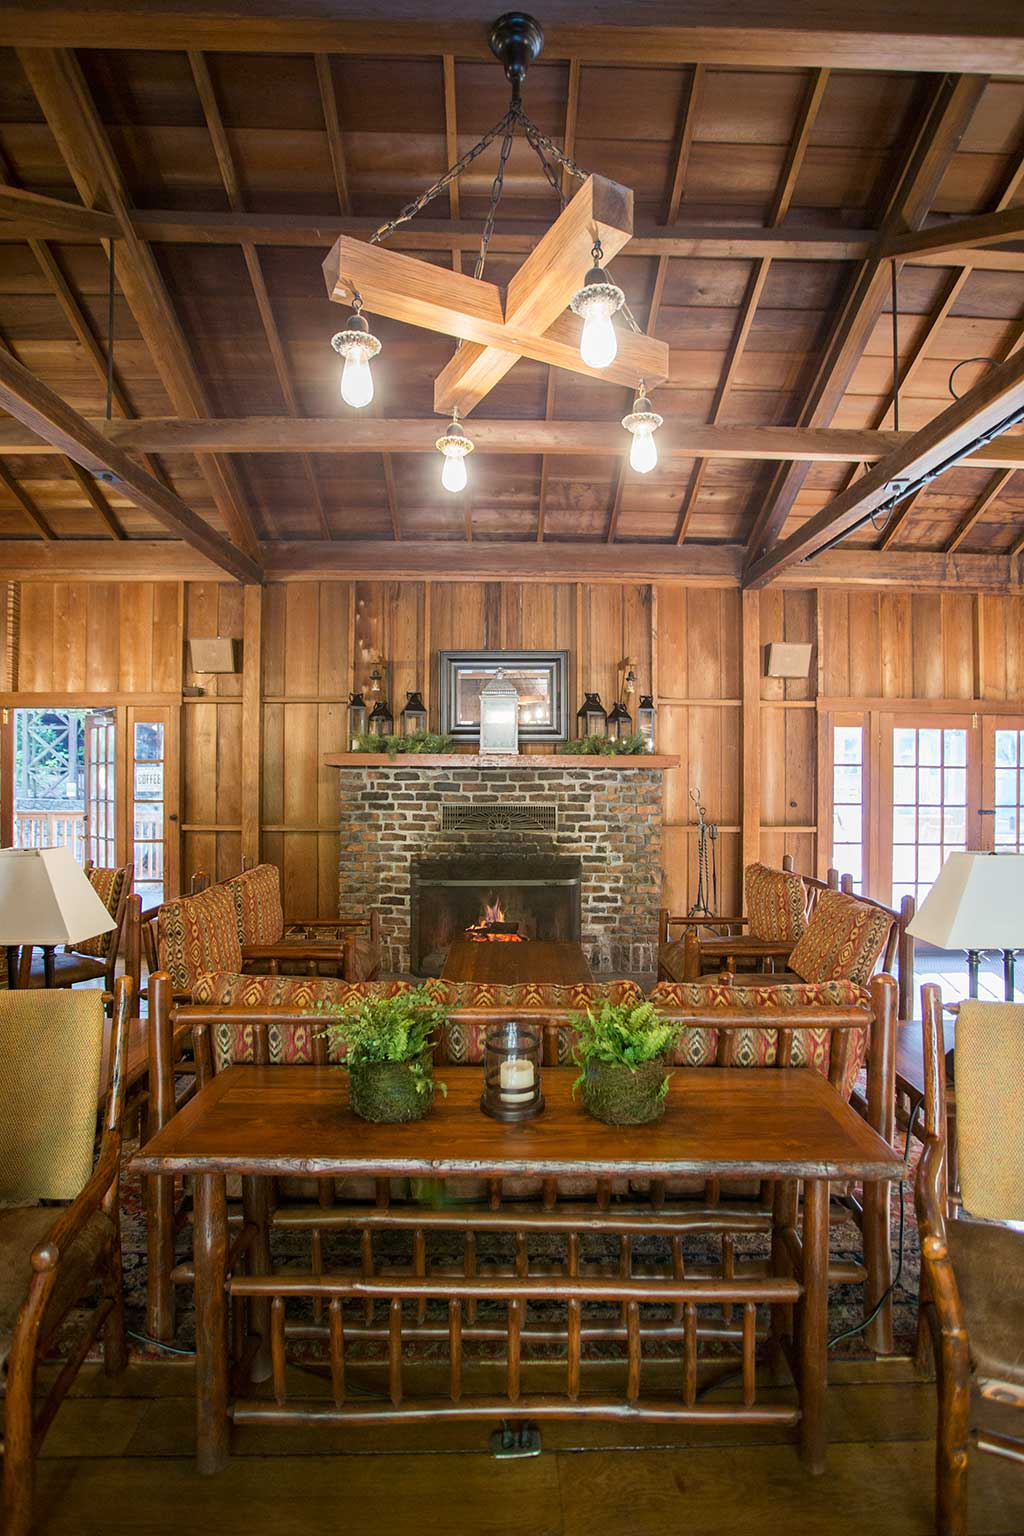 drive-swim-fly-california-mount-hermon-christian-retreat-camp-coffee-shop-common-area-fireplace